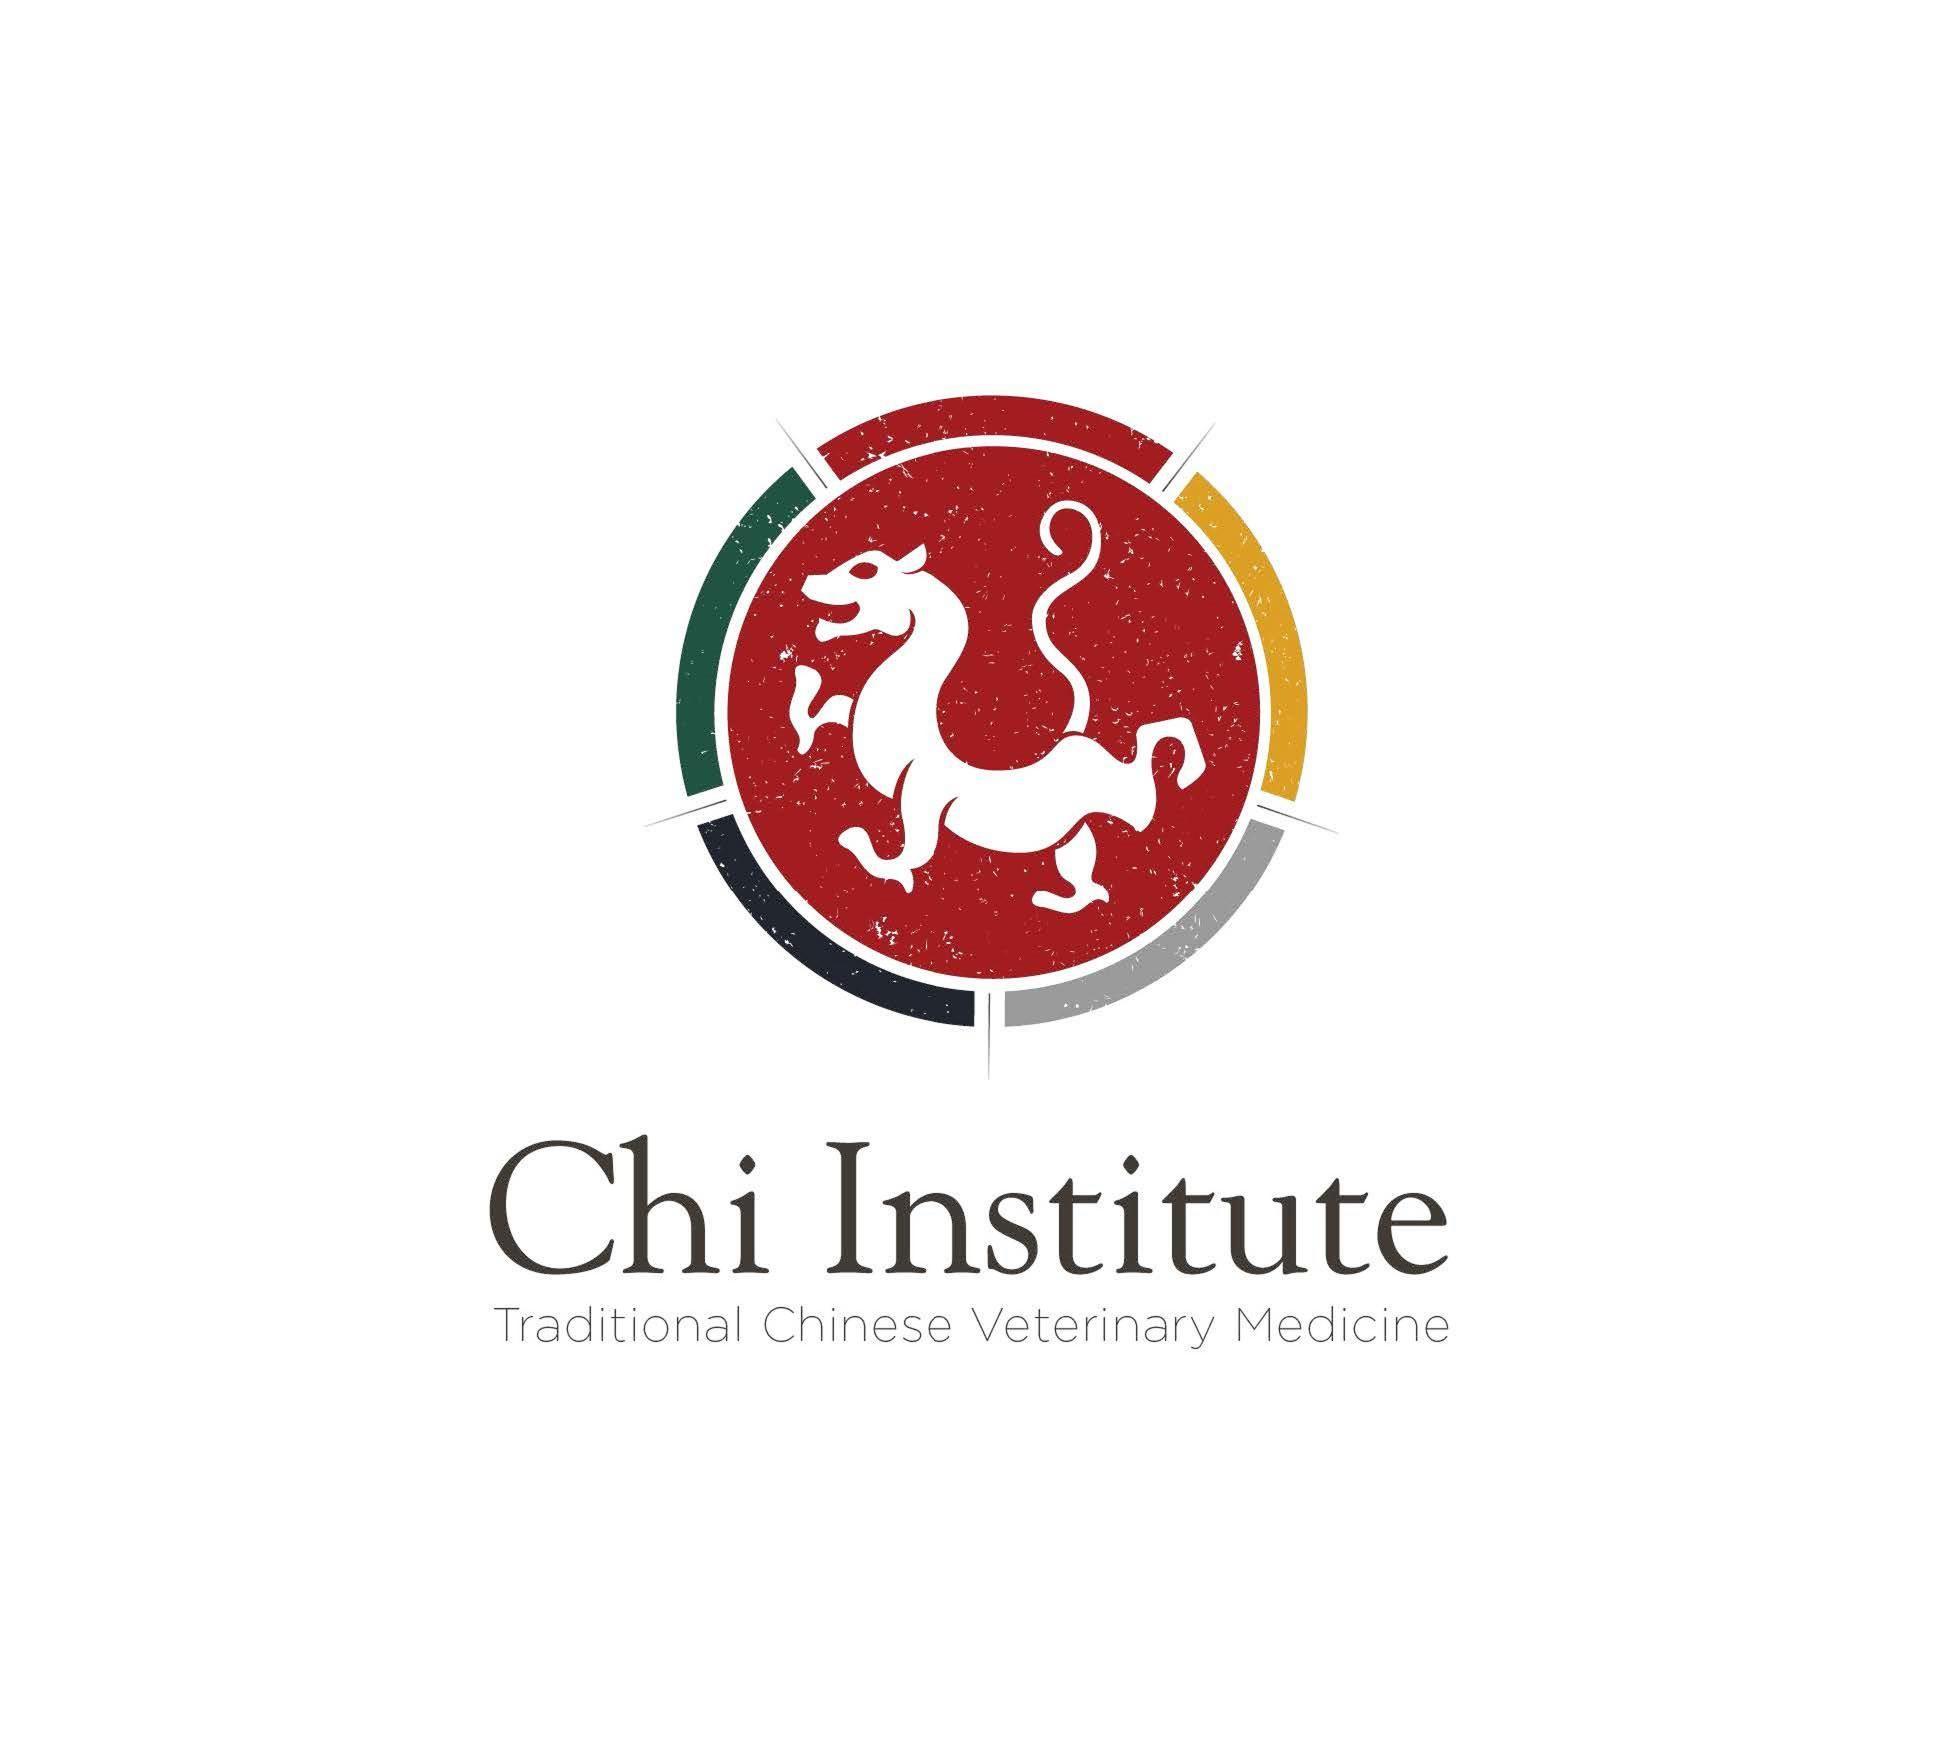 Chi University